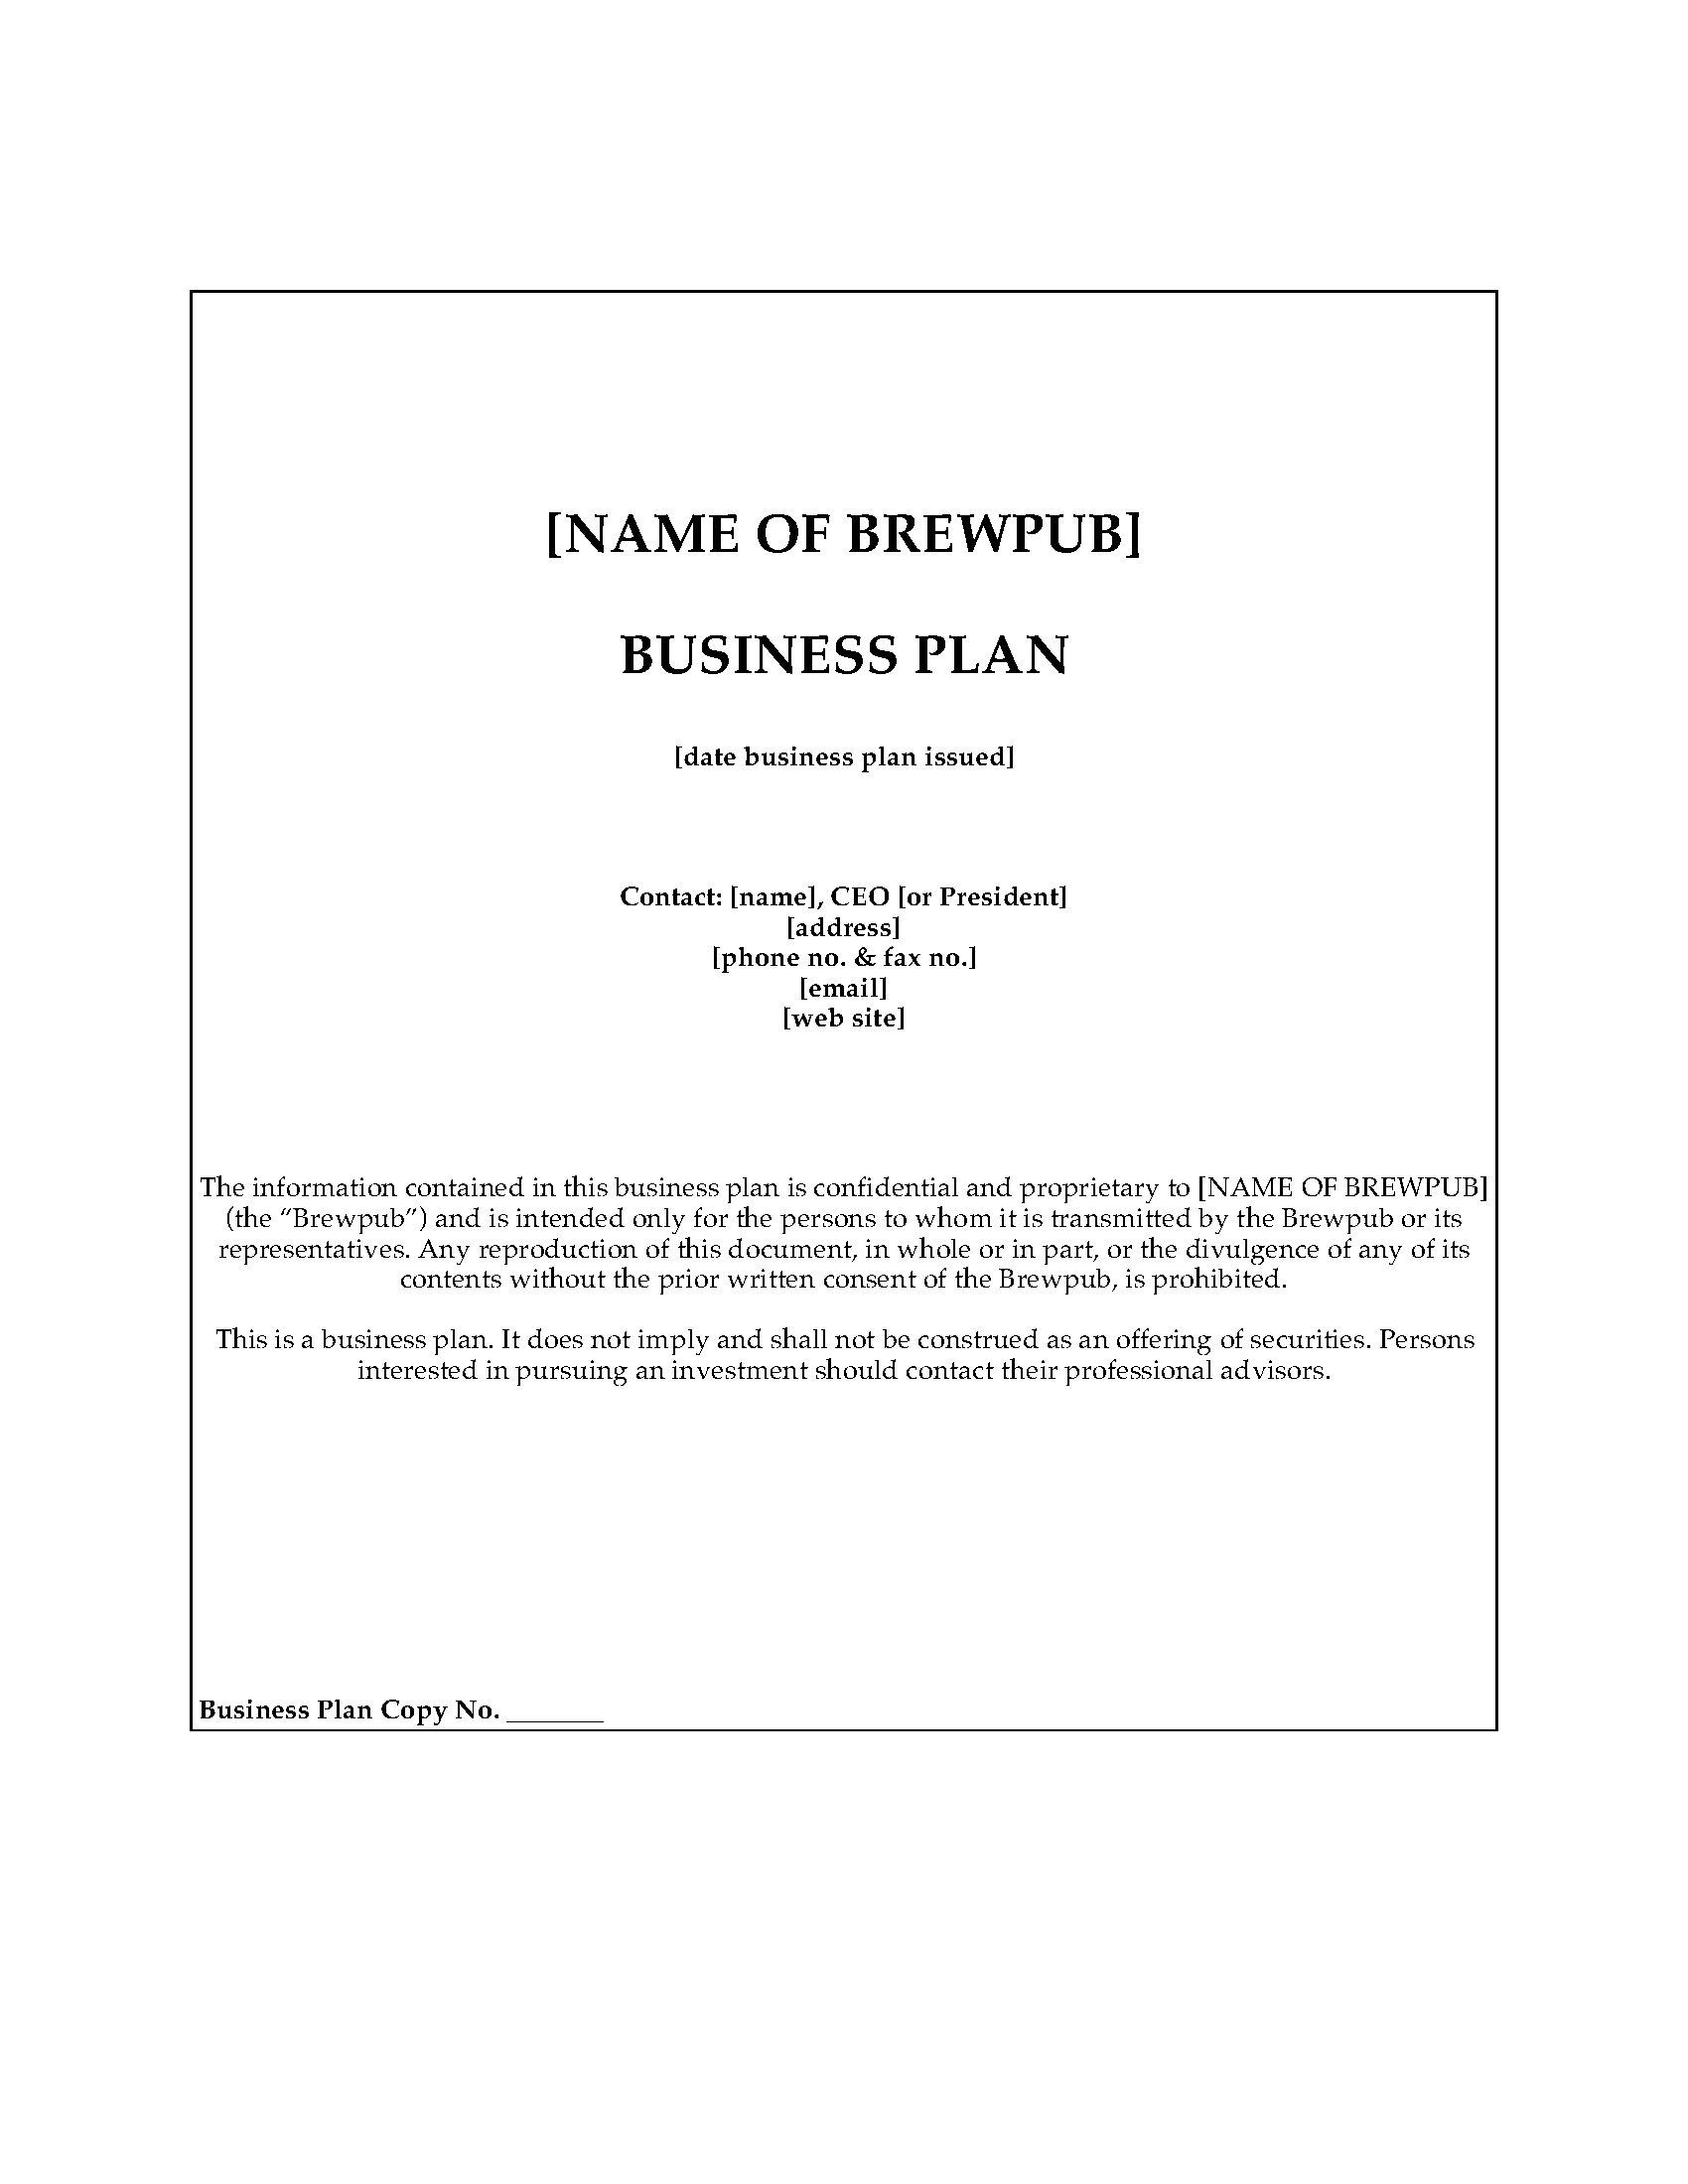 Brewpub business plan template